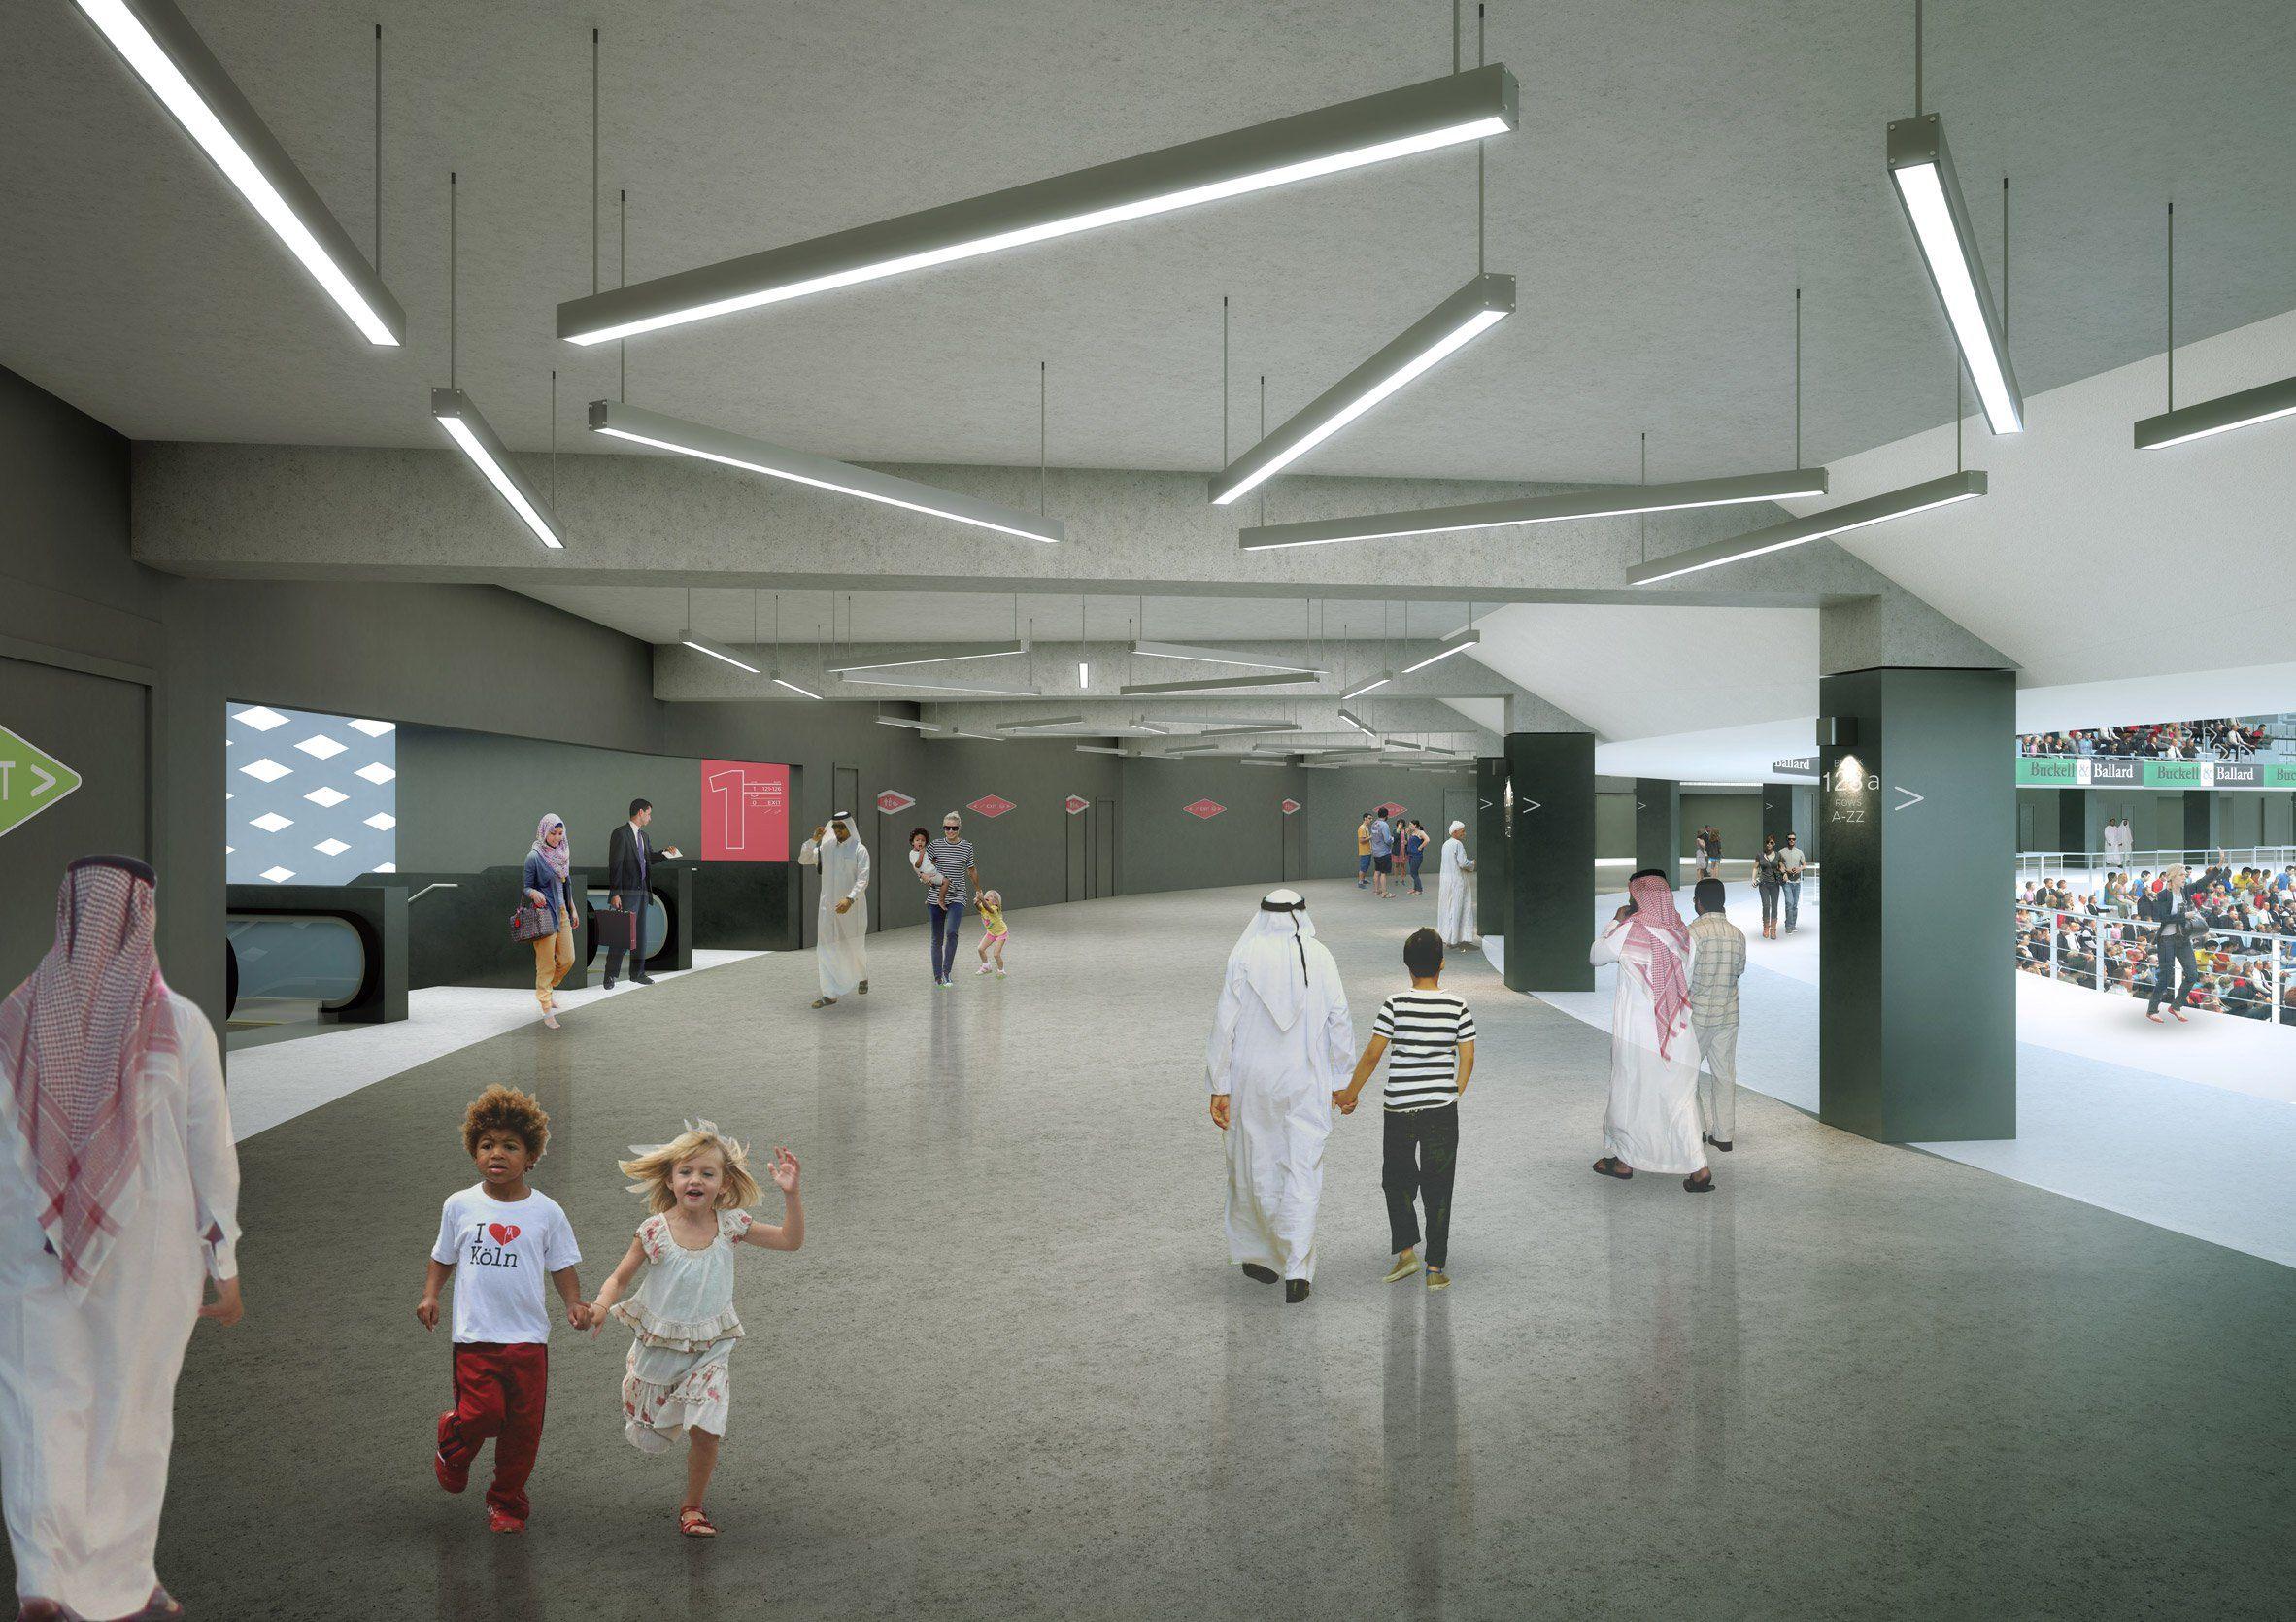 Al Thumama Stadium by Ibrahim M Jaidah | Architecture